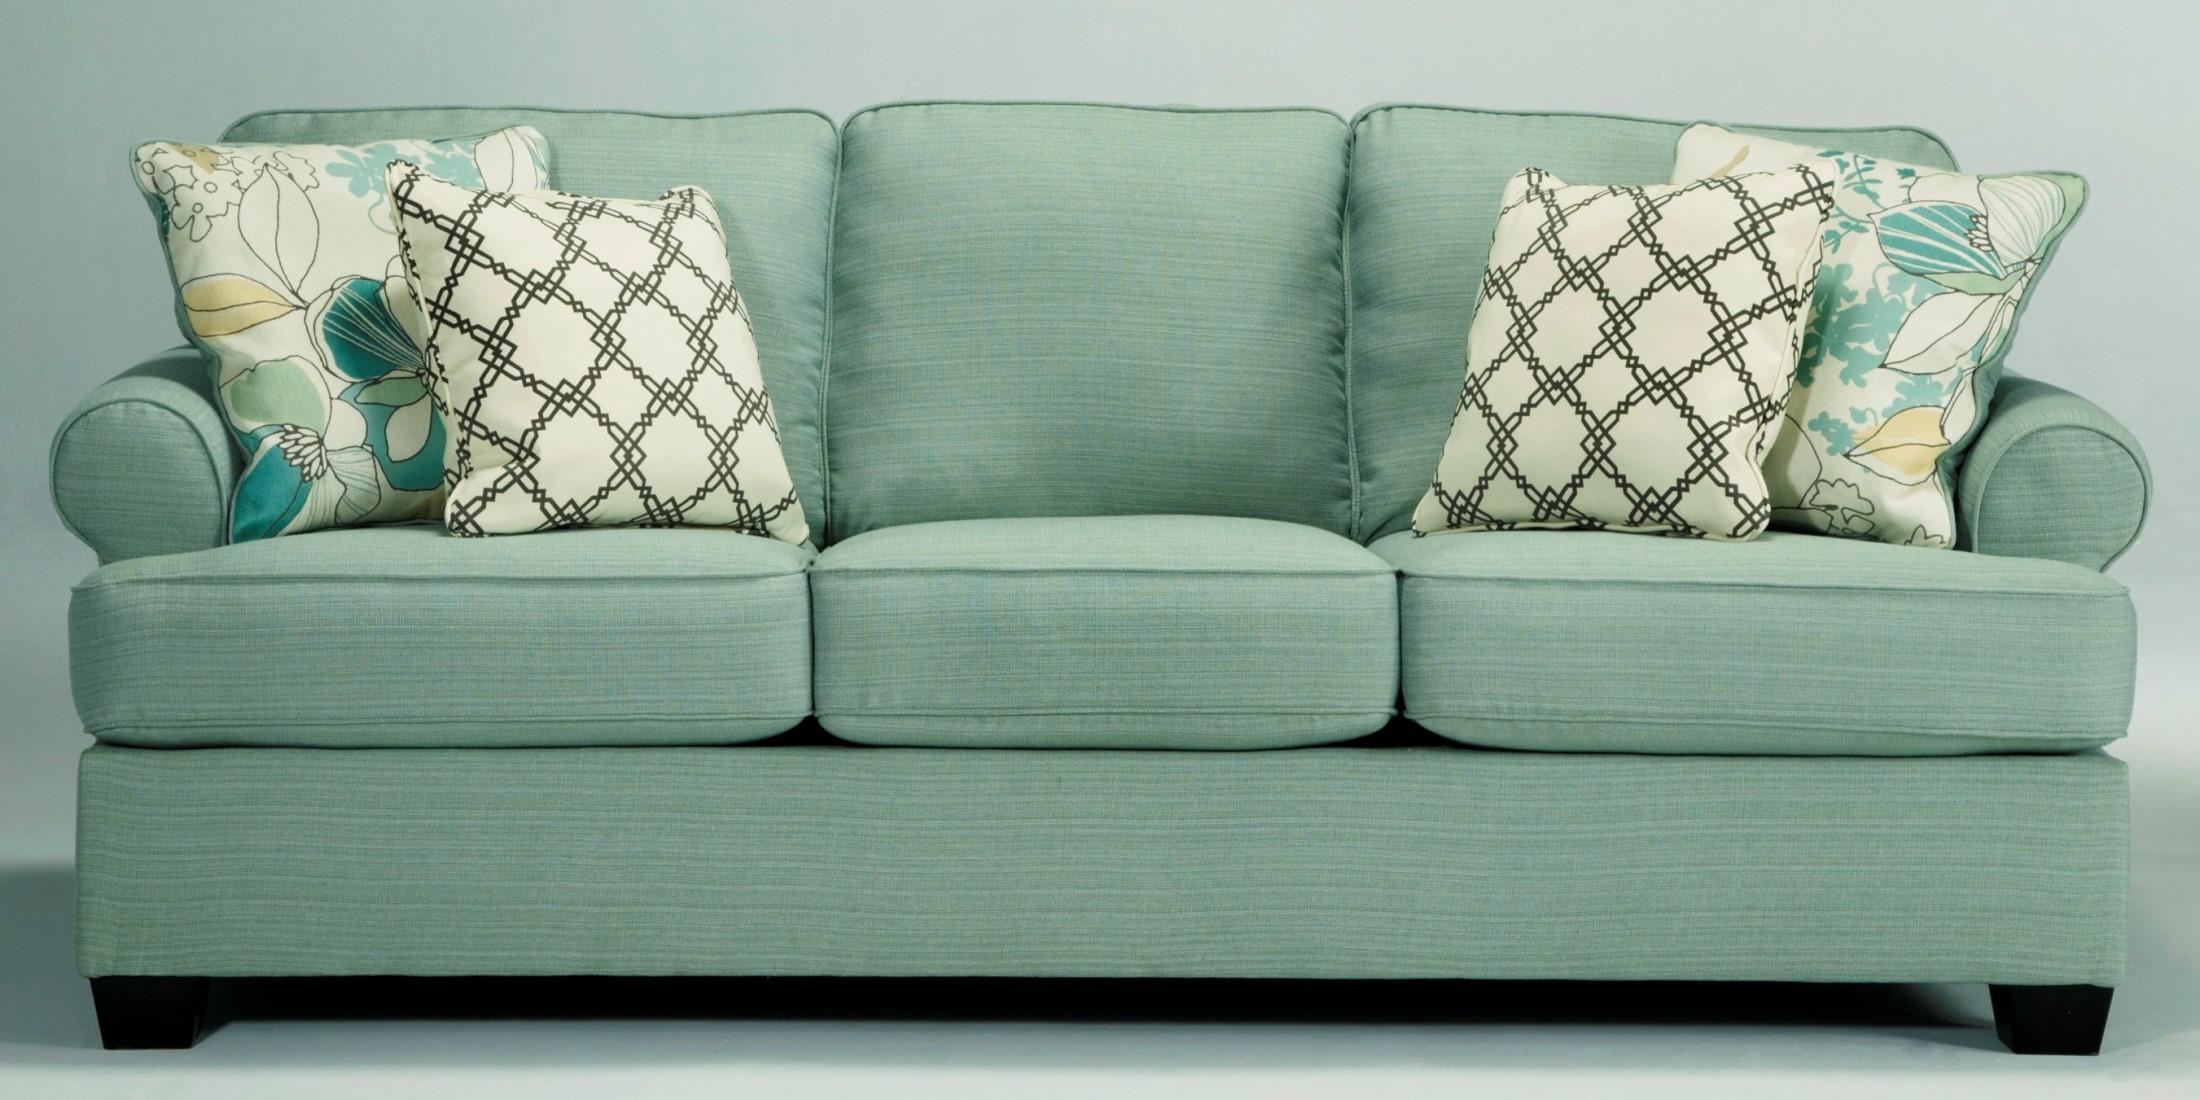 Daystar Living Room Set From Ashley 28200 38 35